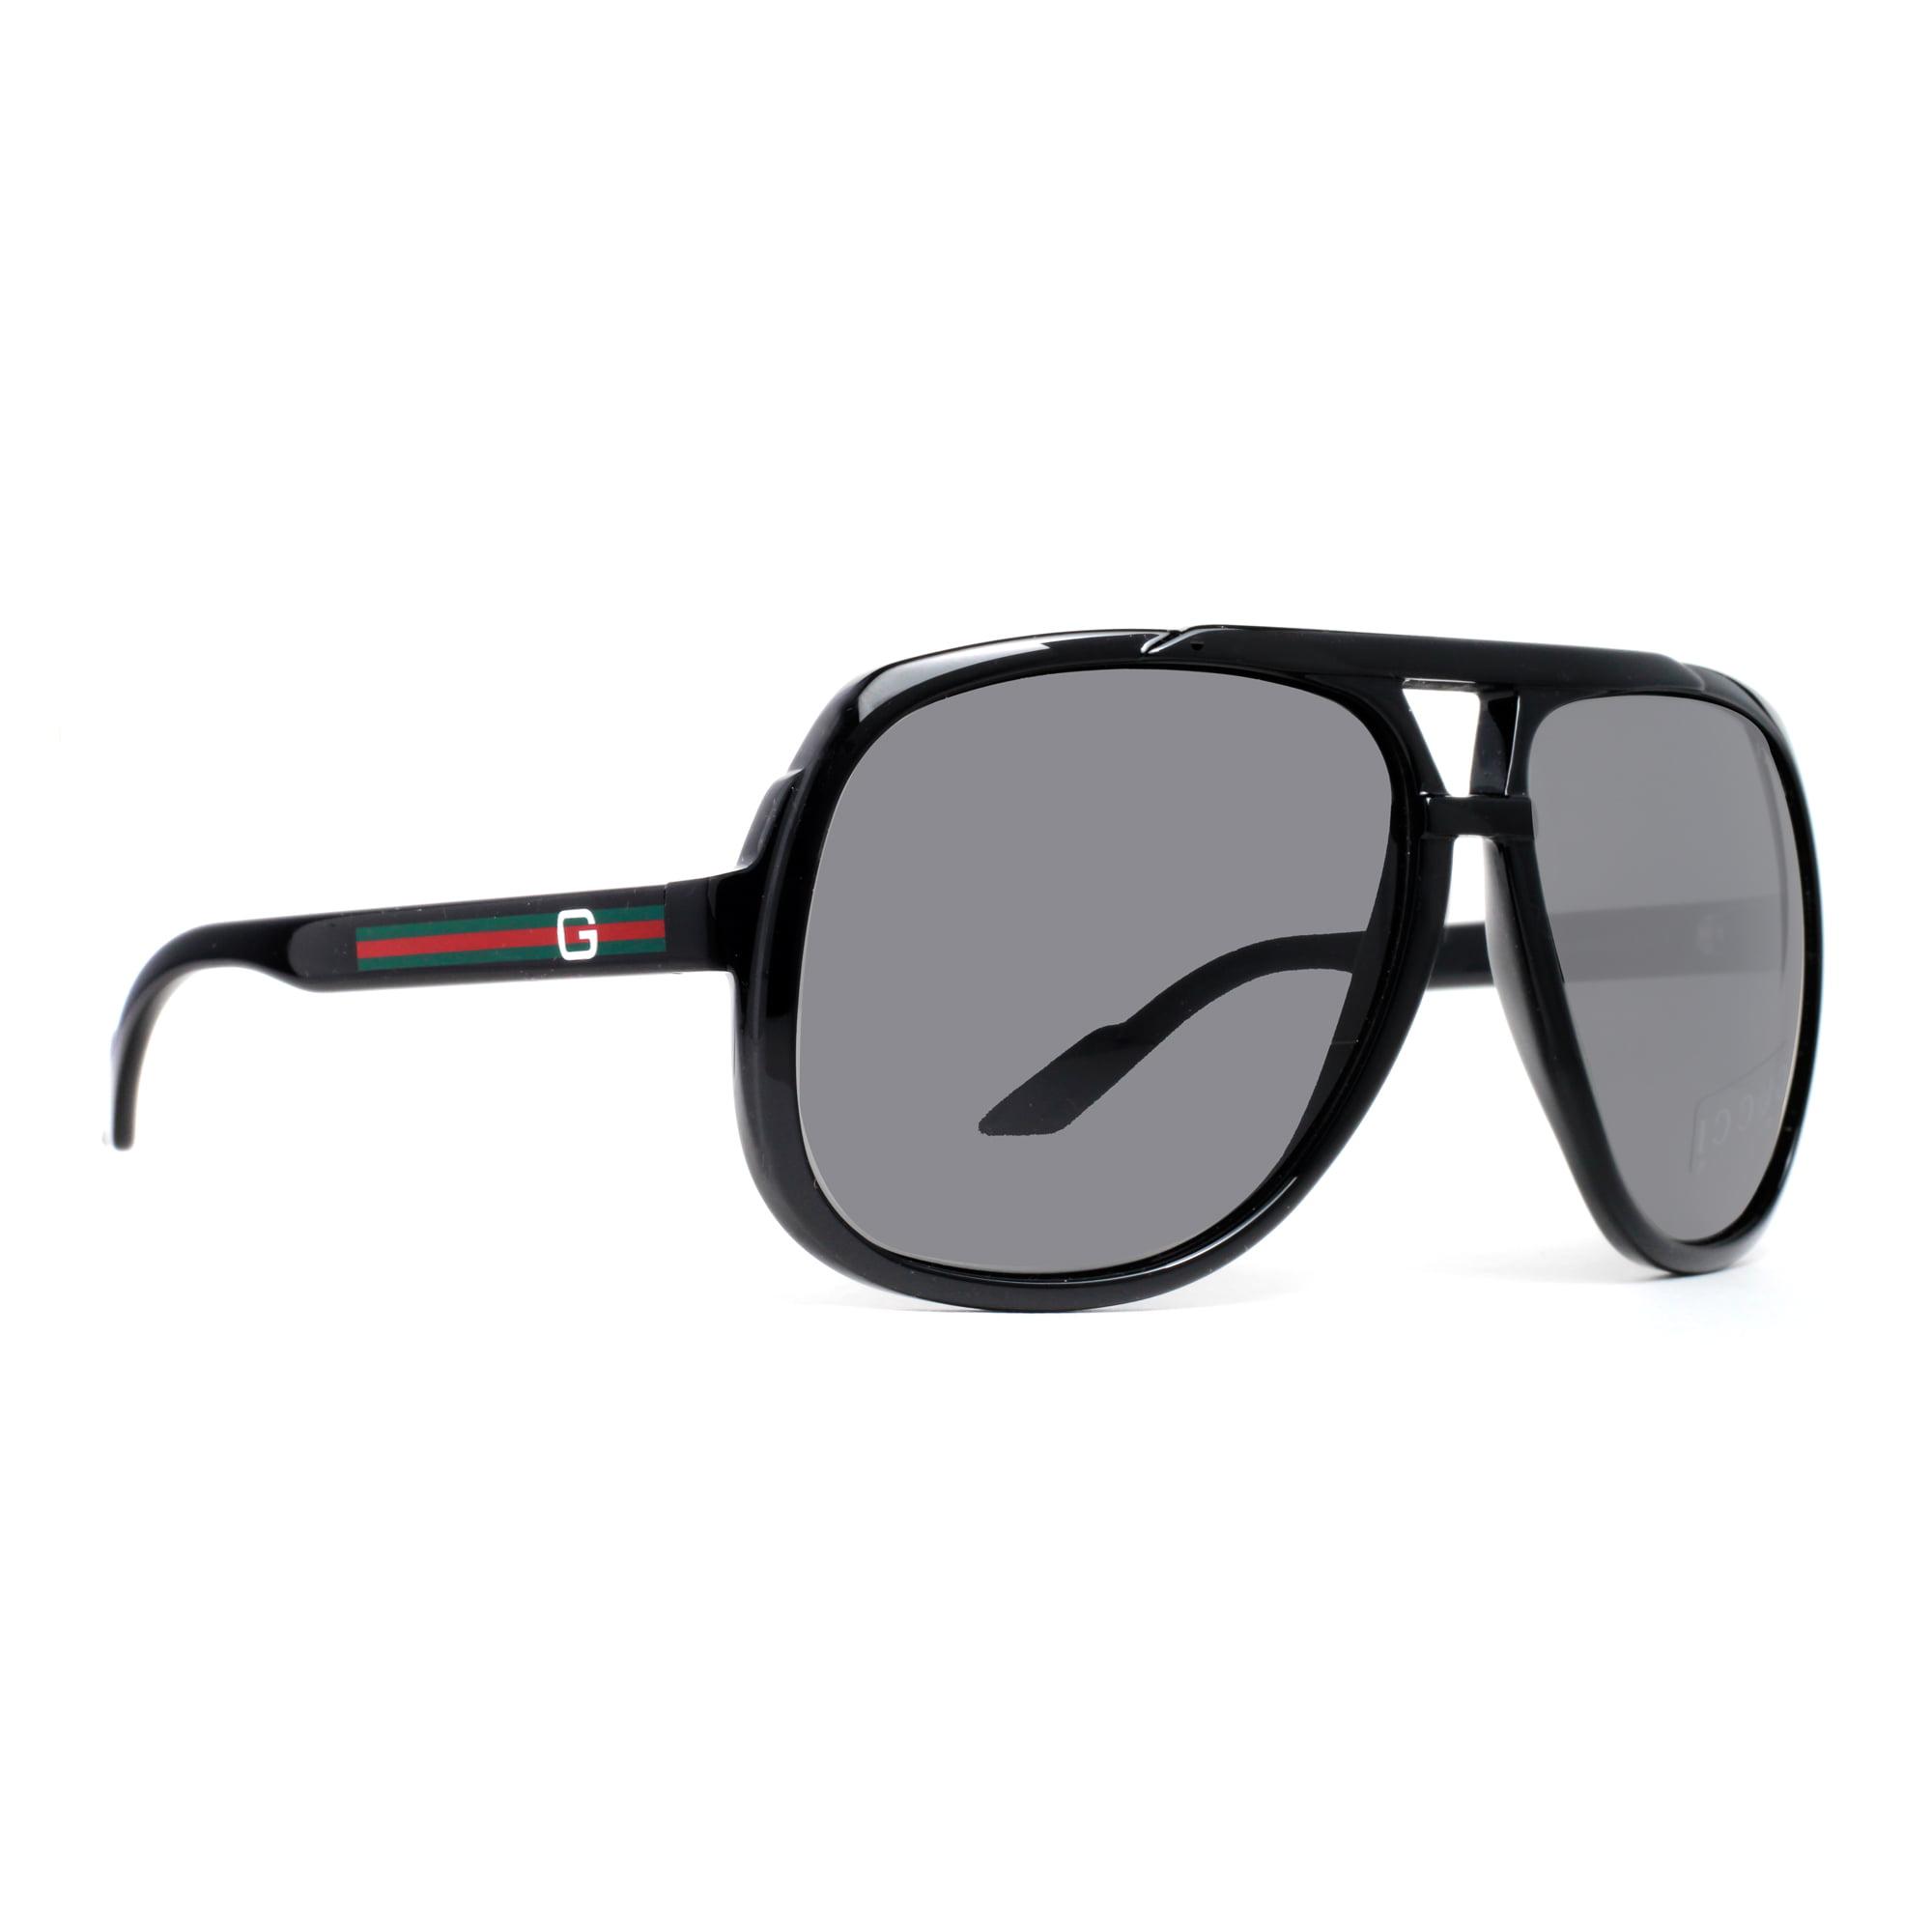 9fe2ccf3cc931 GUCCI - Gucci GG 1622 S D28 R6 Shiny Black Grey Square Aviator Sunglasses -  Walmart.com